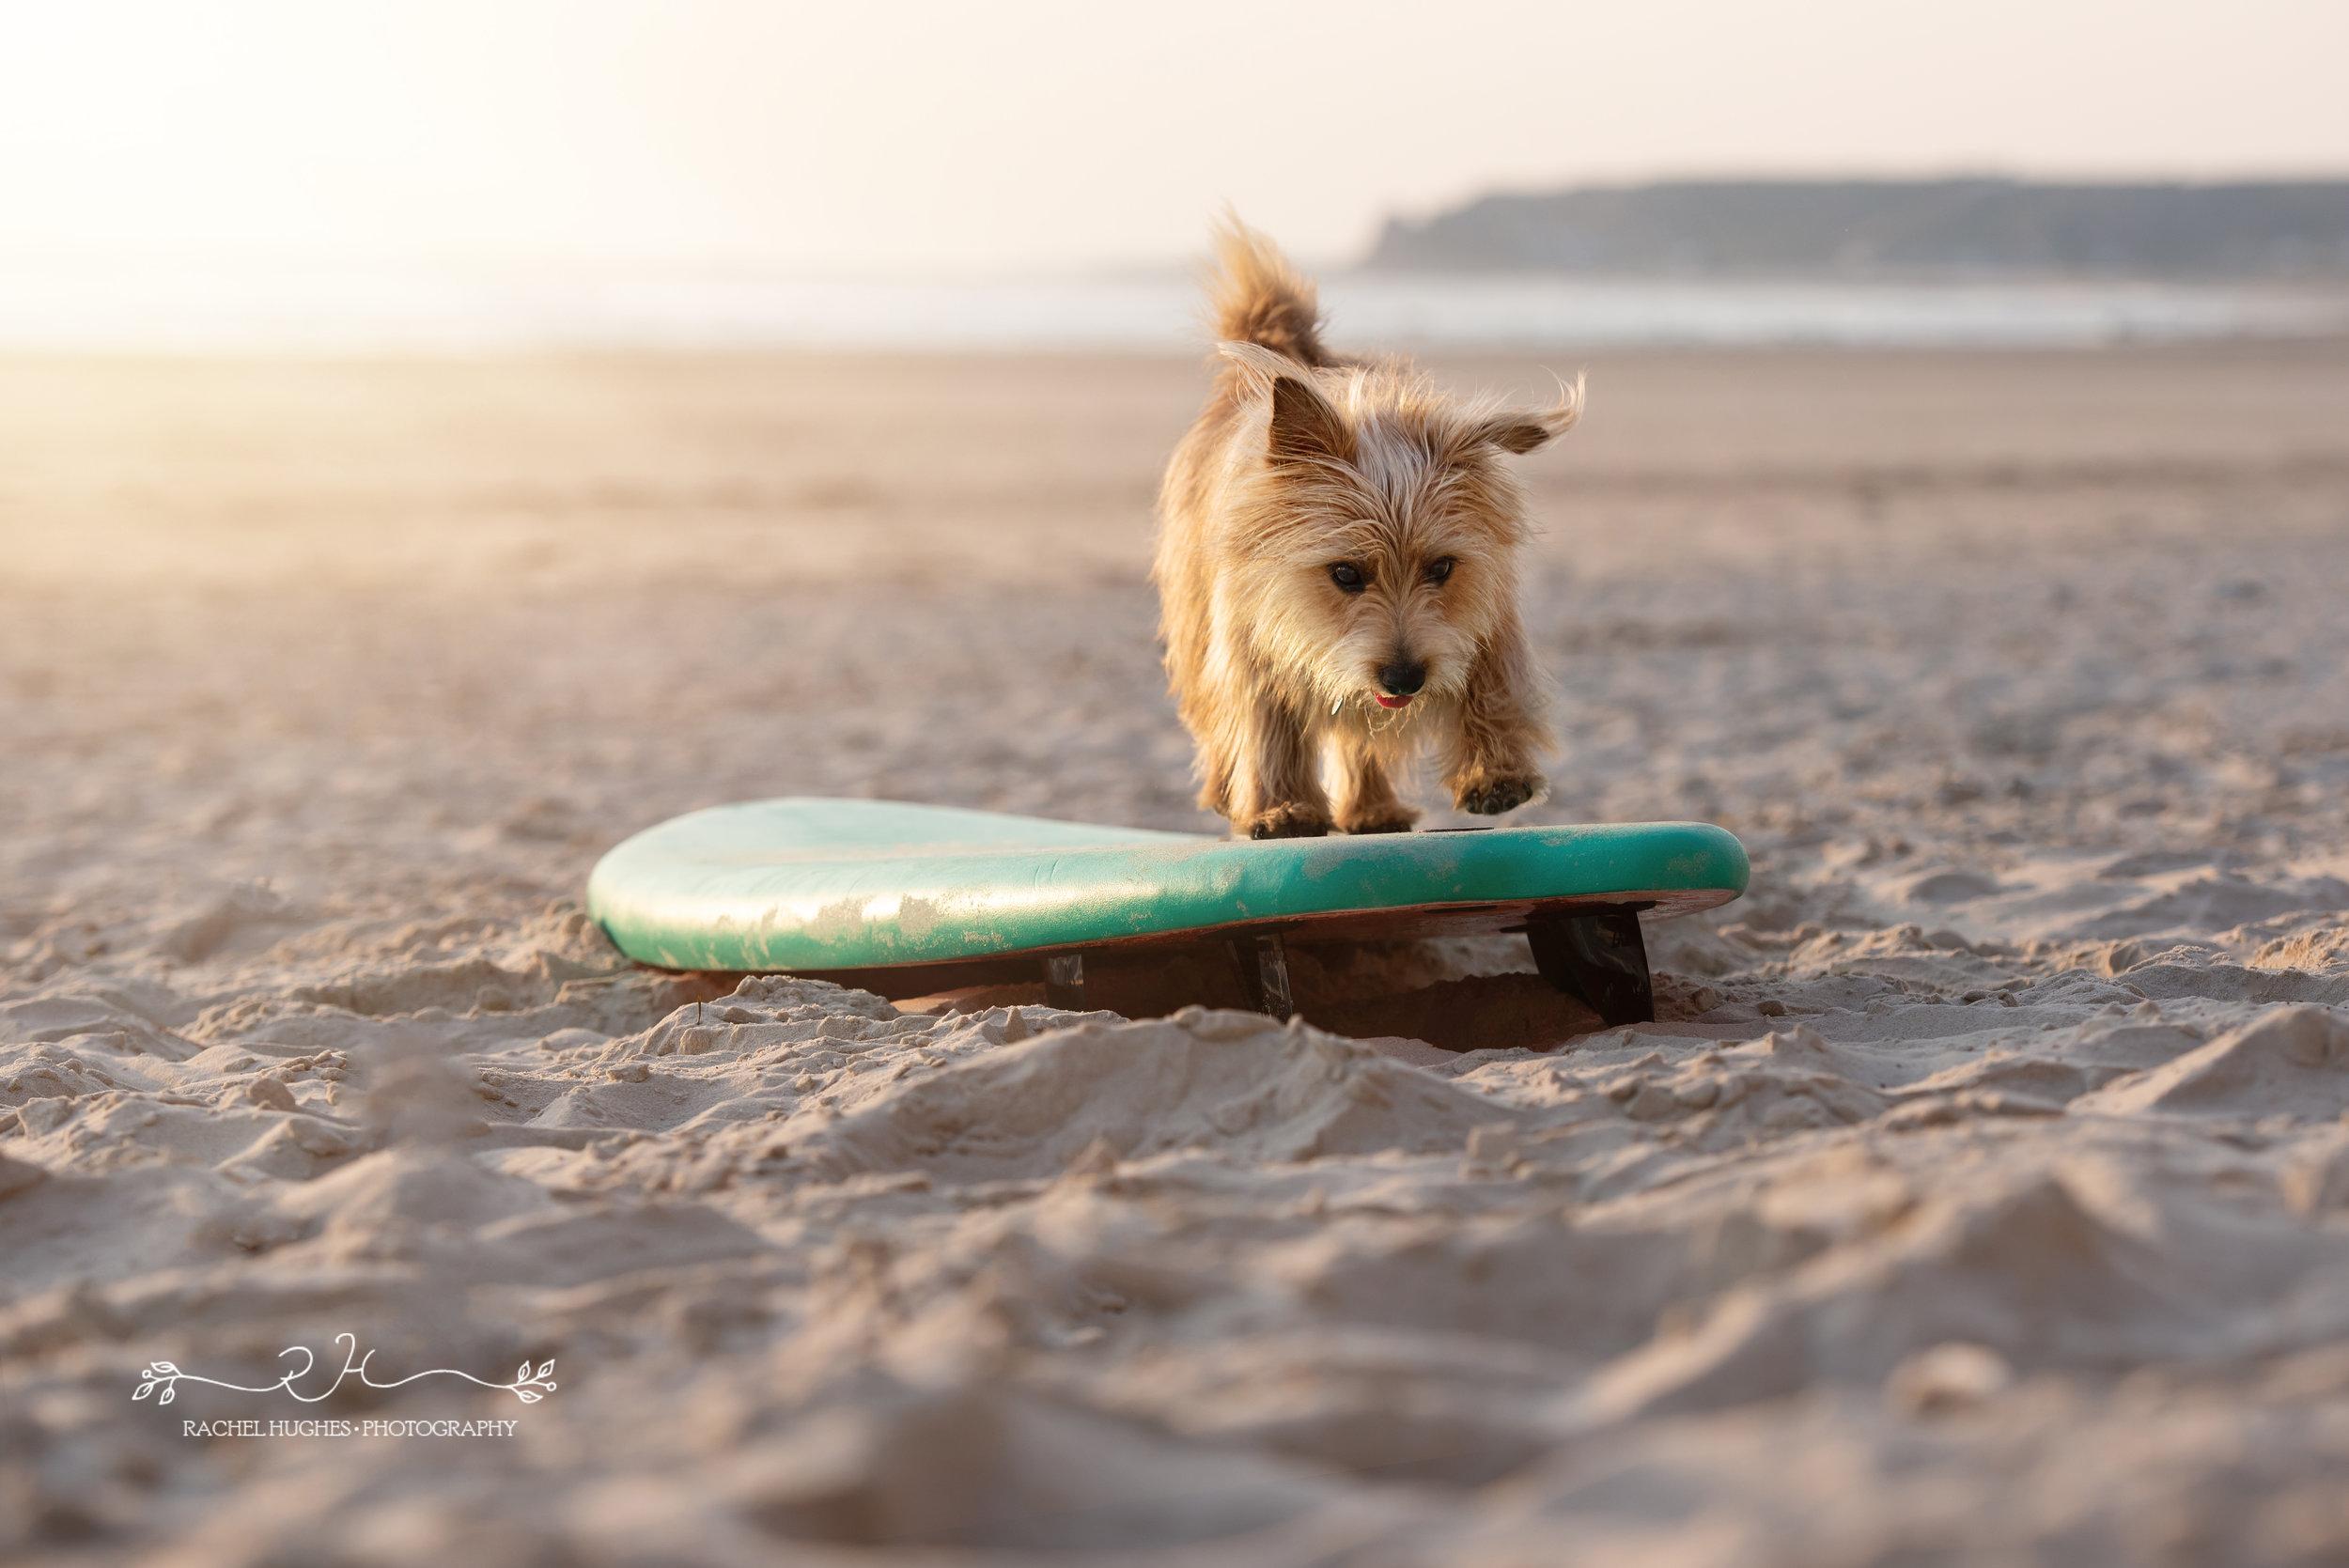 Jersey photographer - pup balancing on surfboard